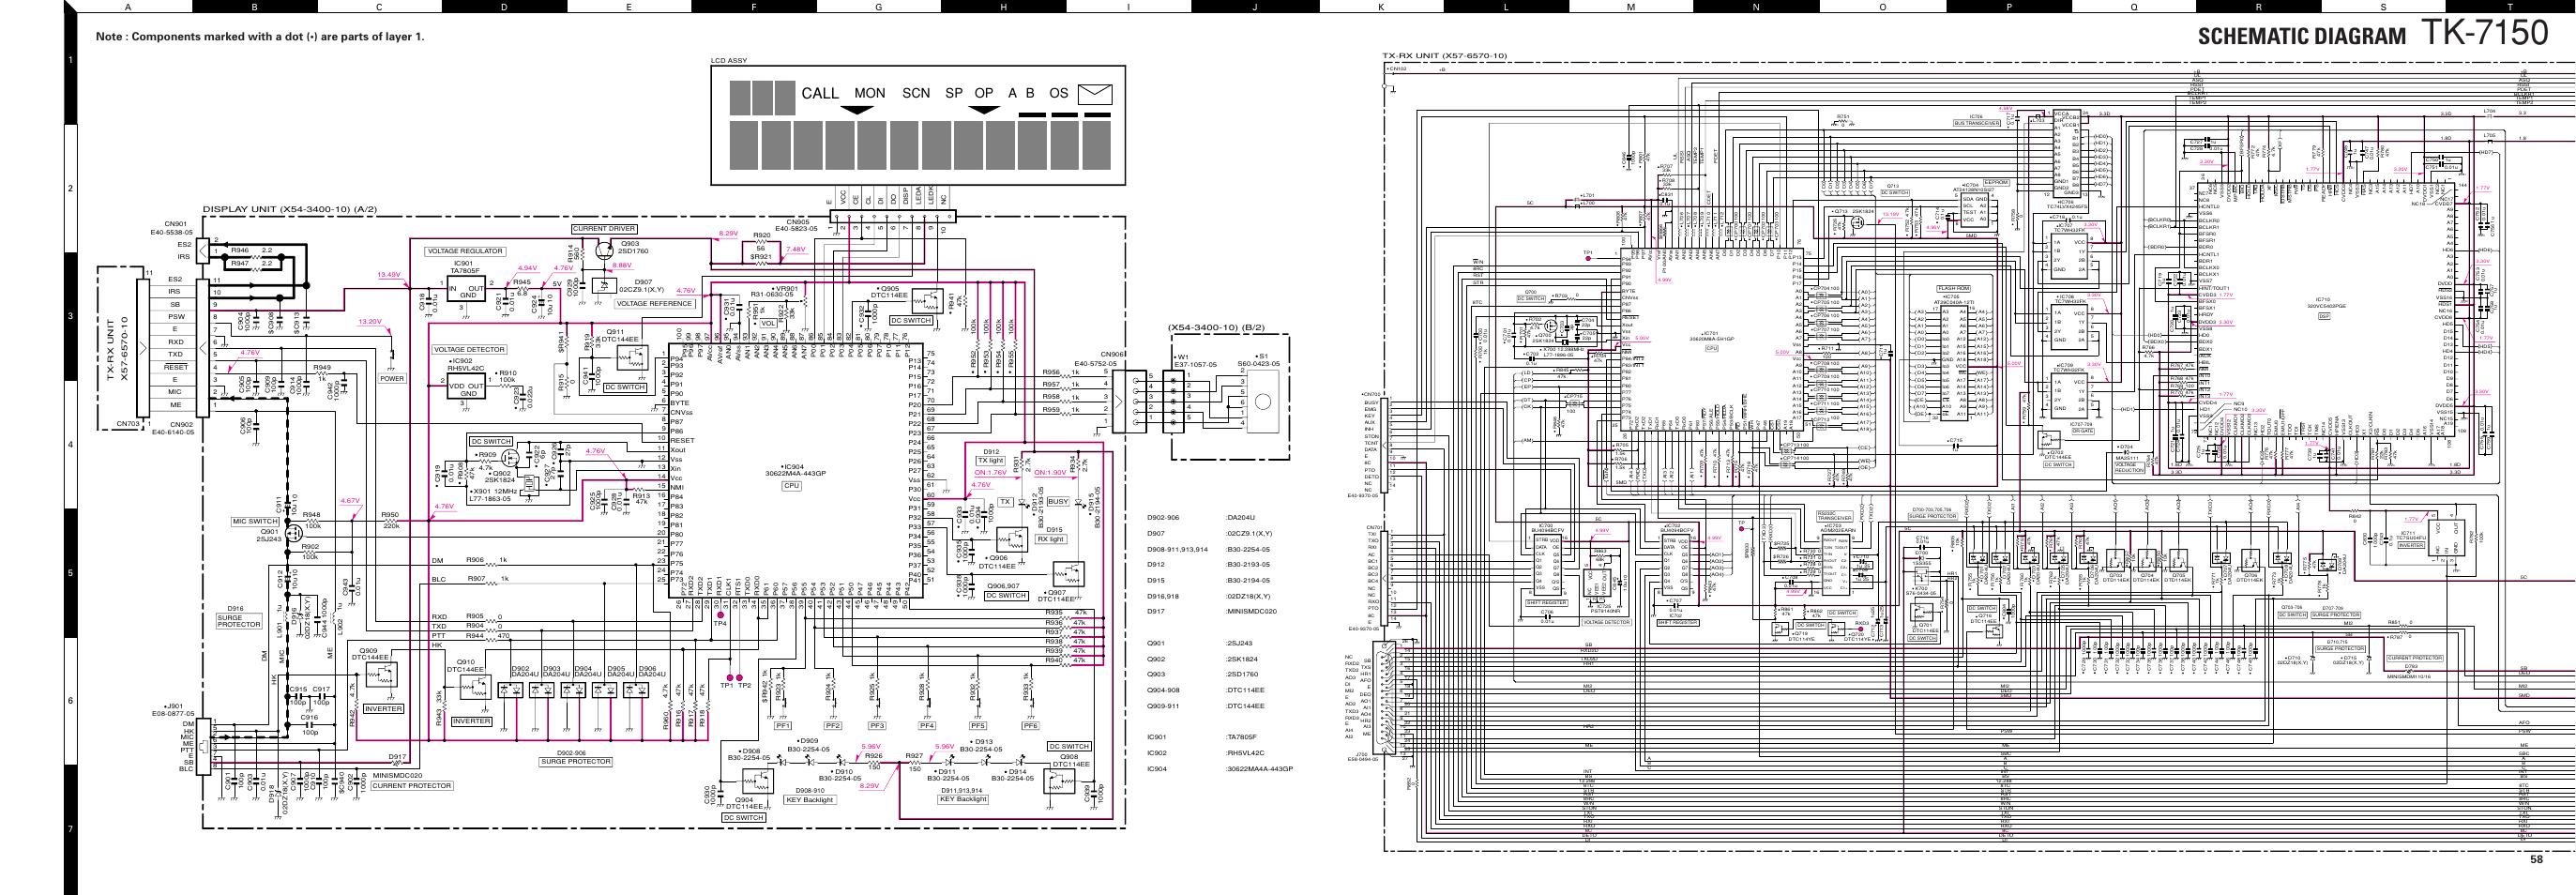 Schematic Diagram  Display Unit  X54